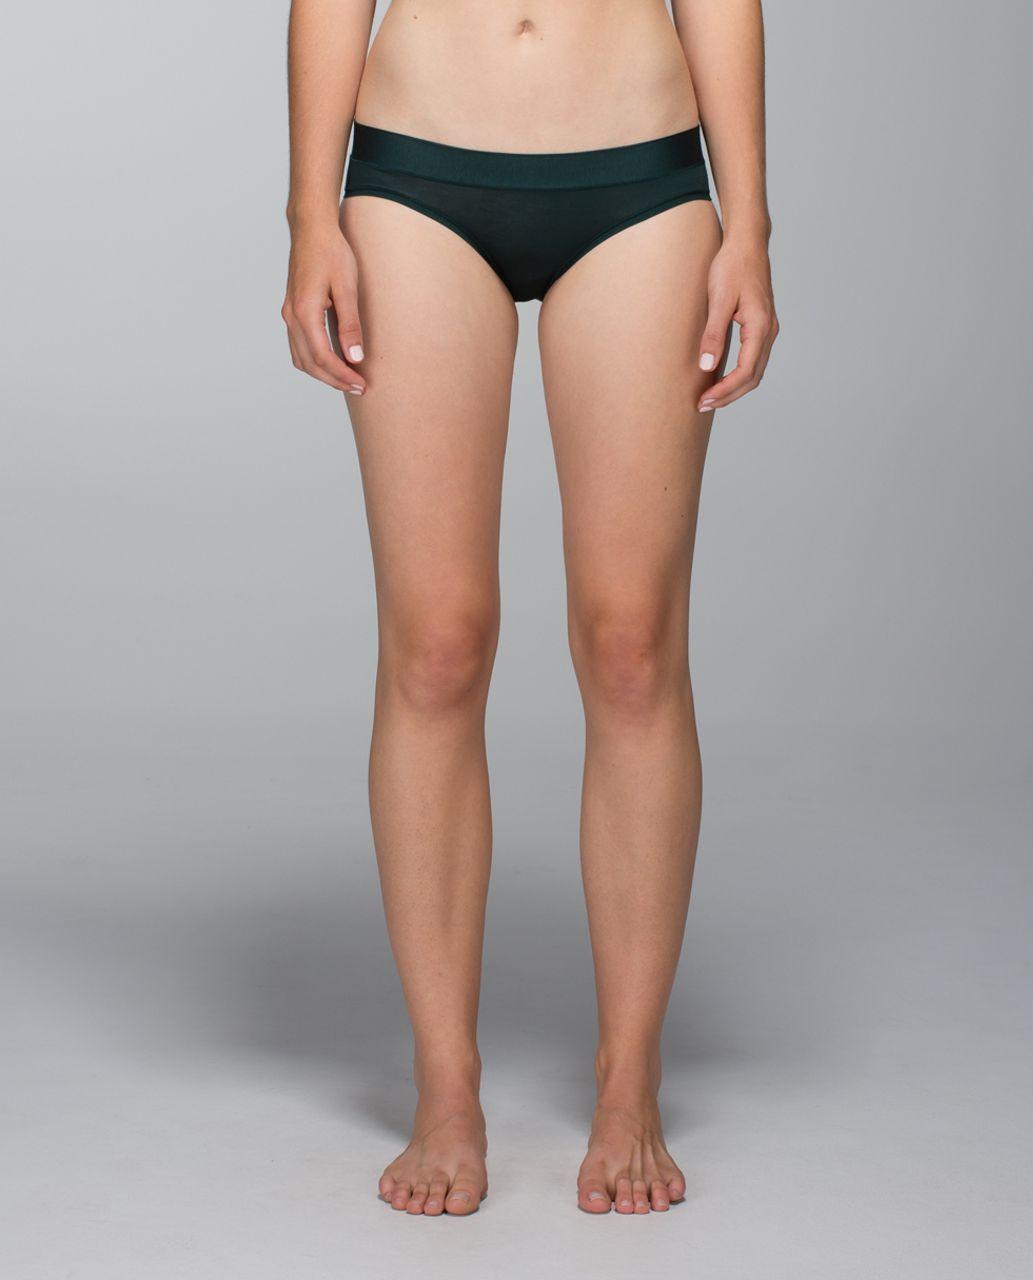 Lululemon Mula Bandhawear Bikini - Fuel Green